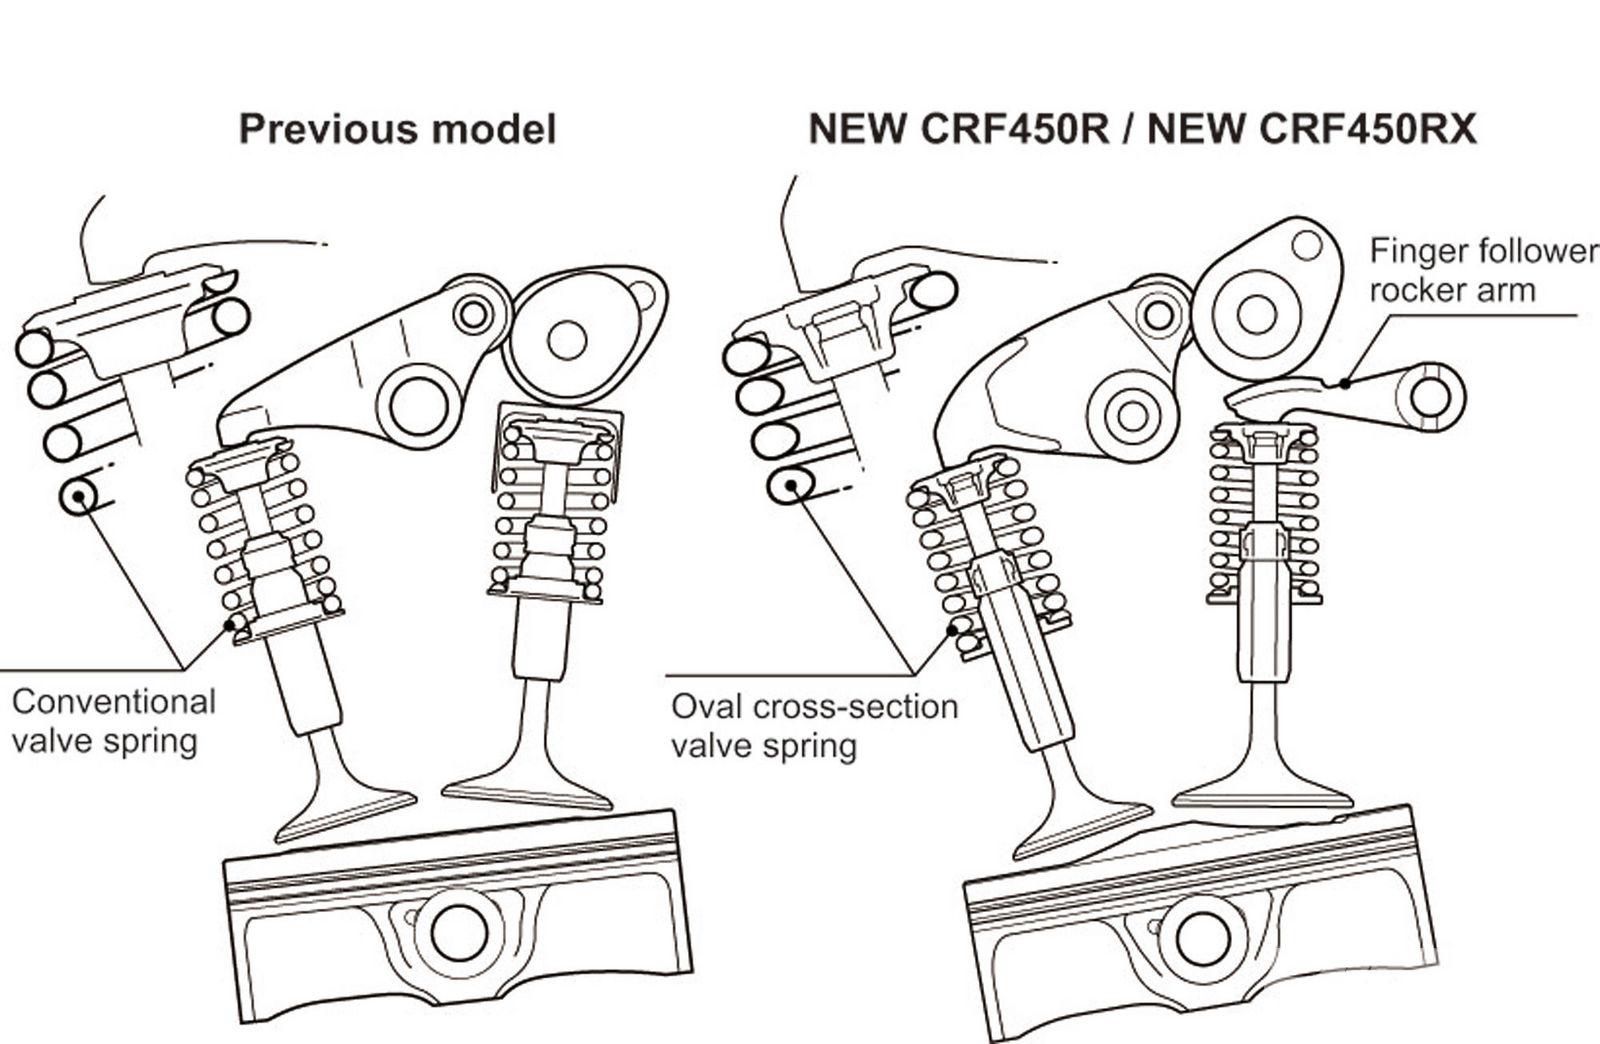 Honda Foreman Parts List Diagram further ML512 13480 also Honda Trx 450r also Page 2 in addition L Gadsden Al. on honda 450r electric start